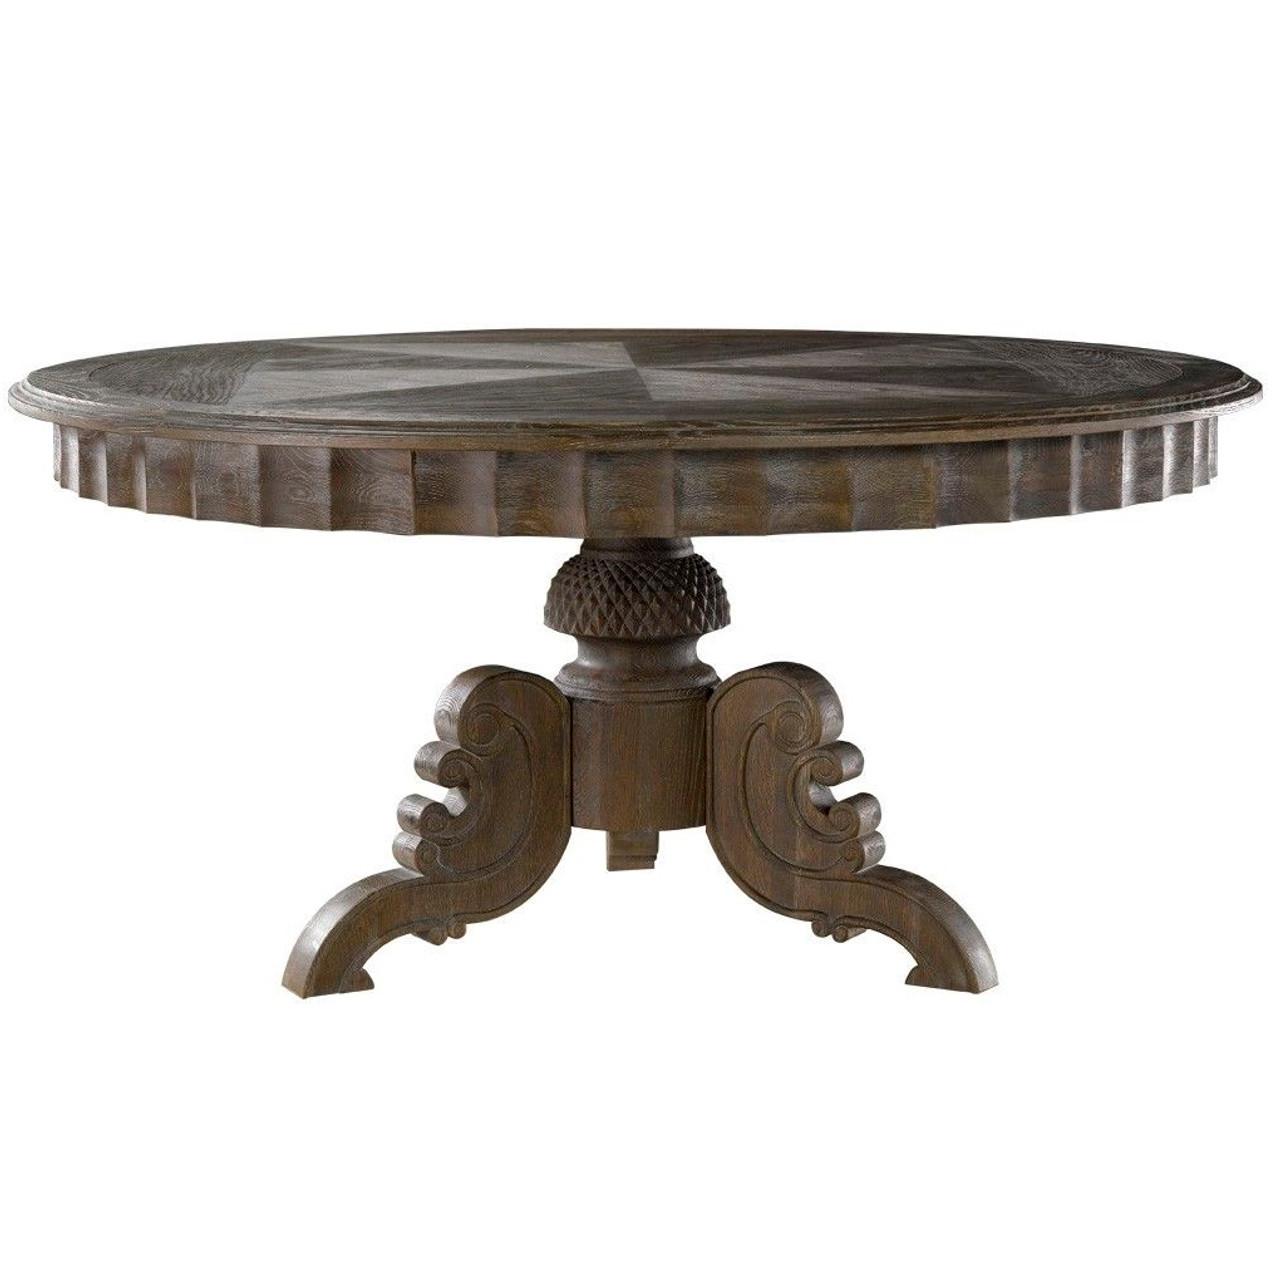 Parisian Gray Oak Round Pedestal Dining Table Zin Home - Round pedestal dining table gray